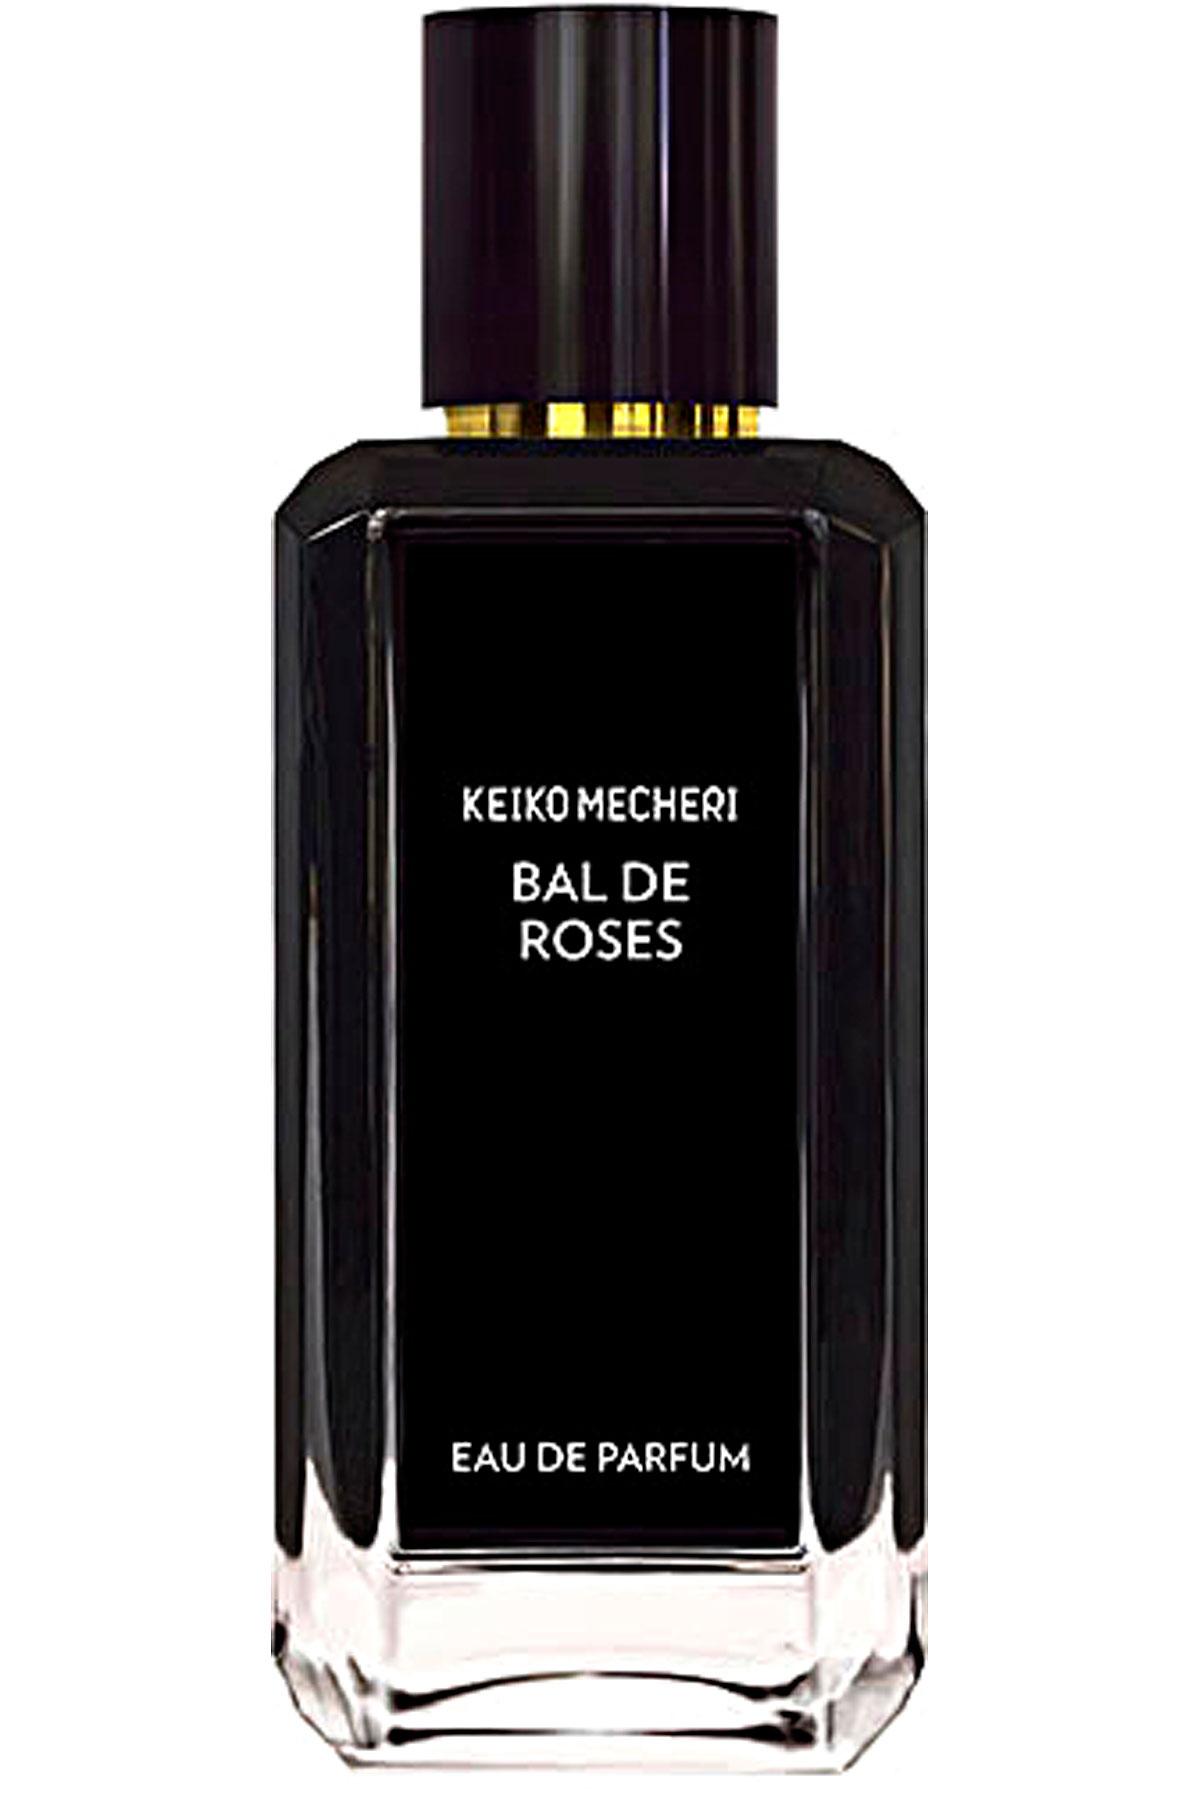 Keiko Mecheri Fragrances for Men, Bal De Roses - Eau De Parfum - 100 Ml, 2019, 100 ml